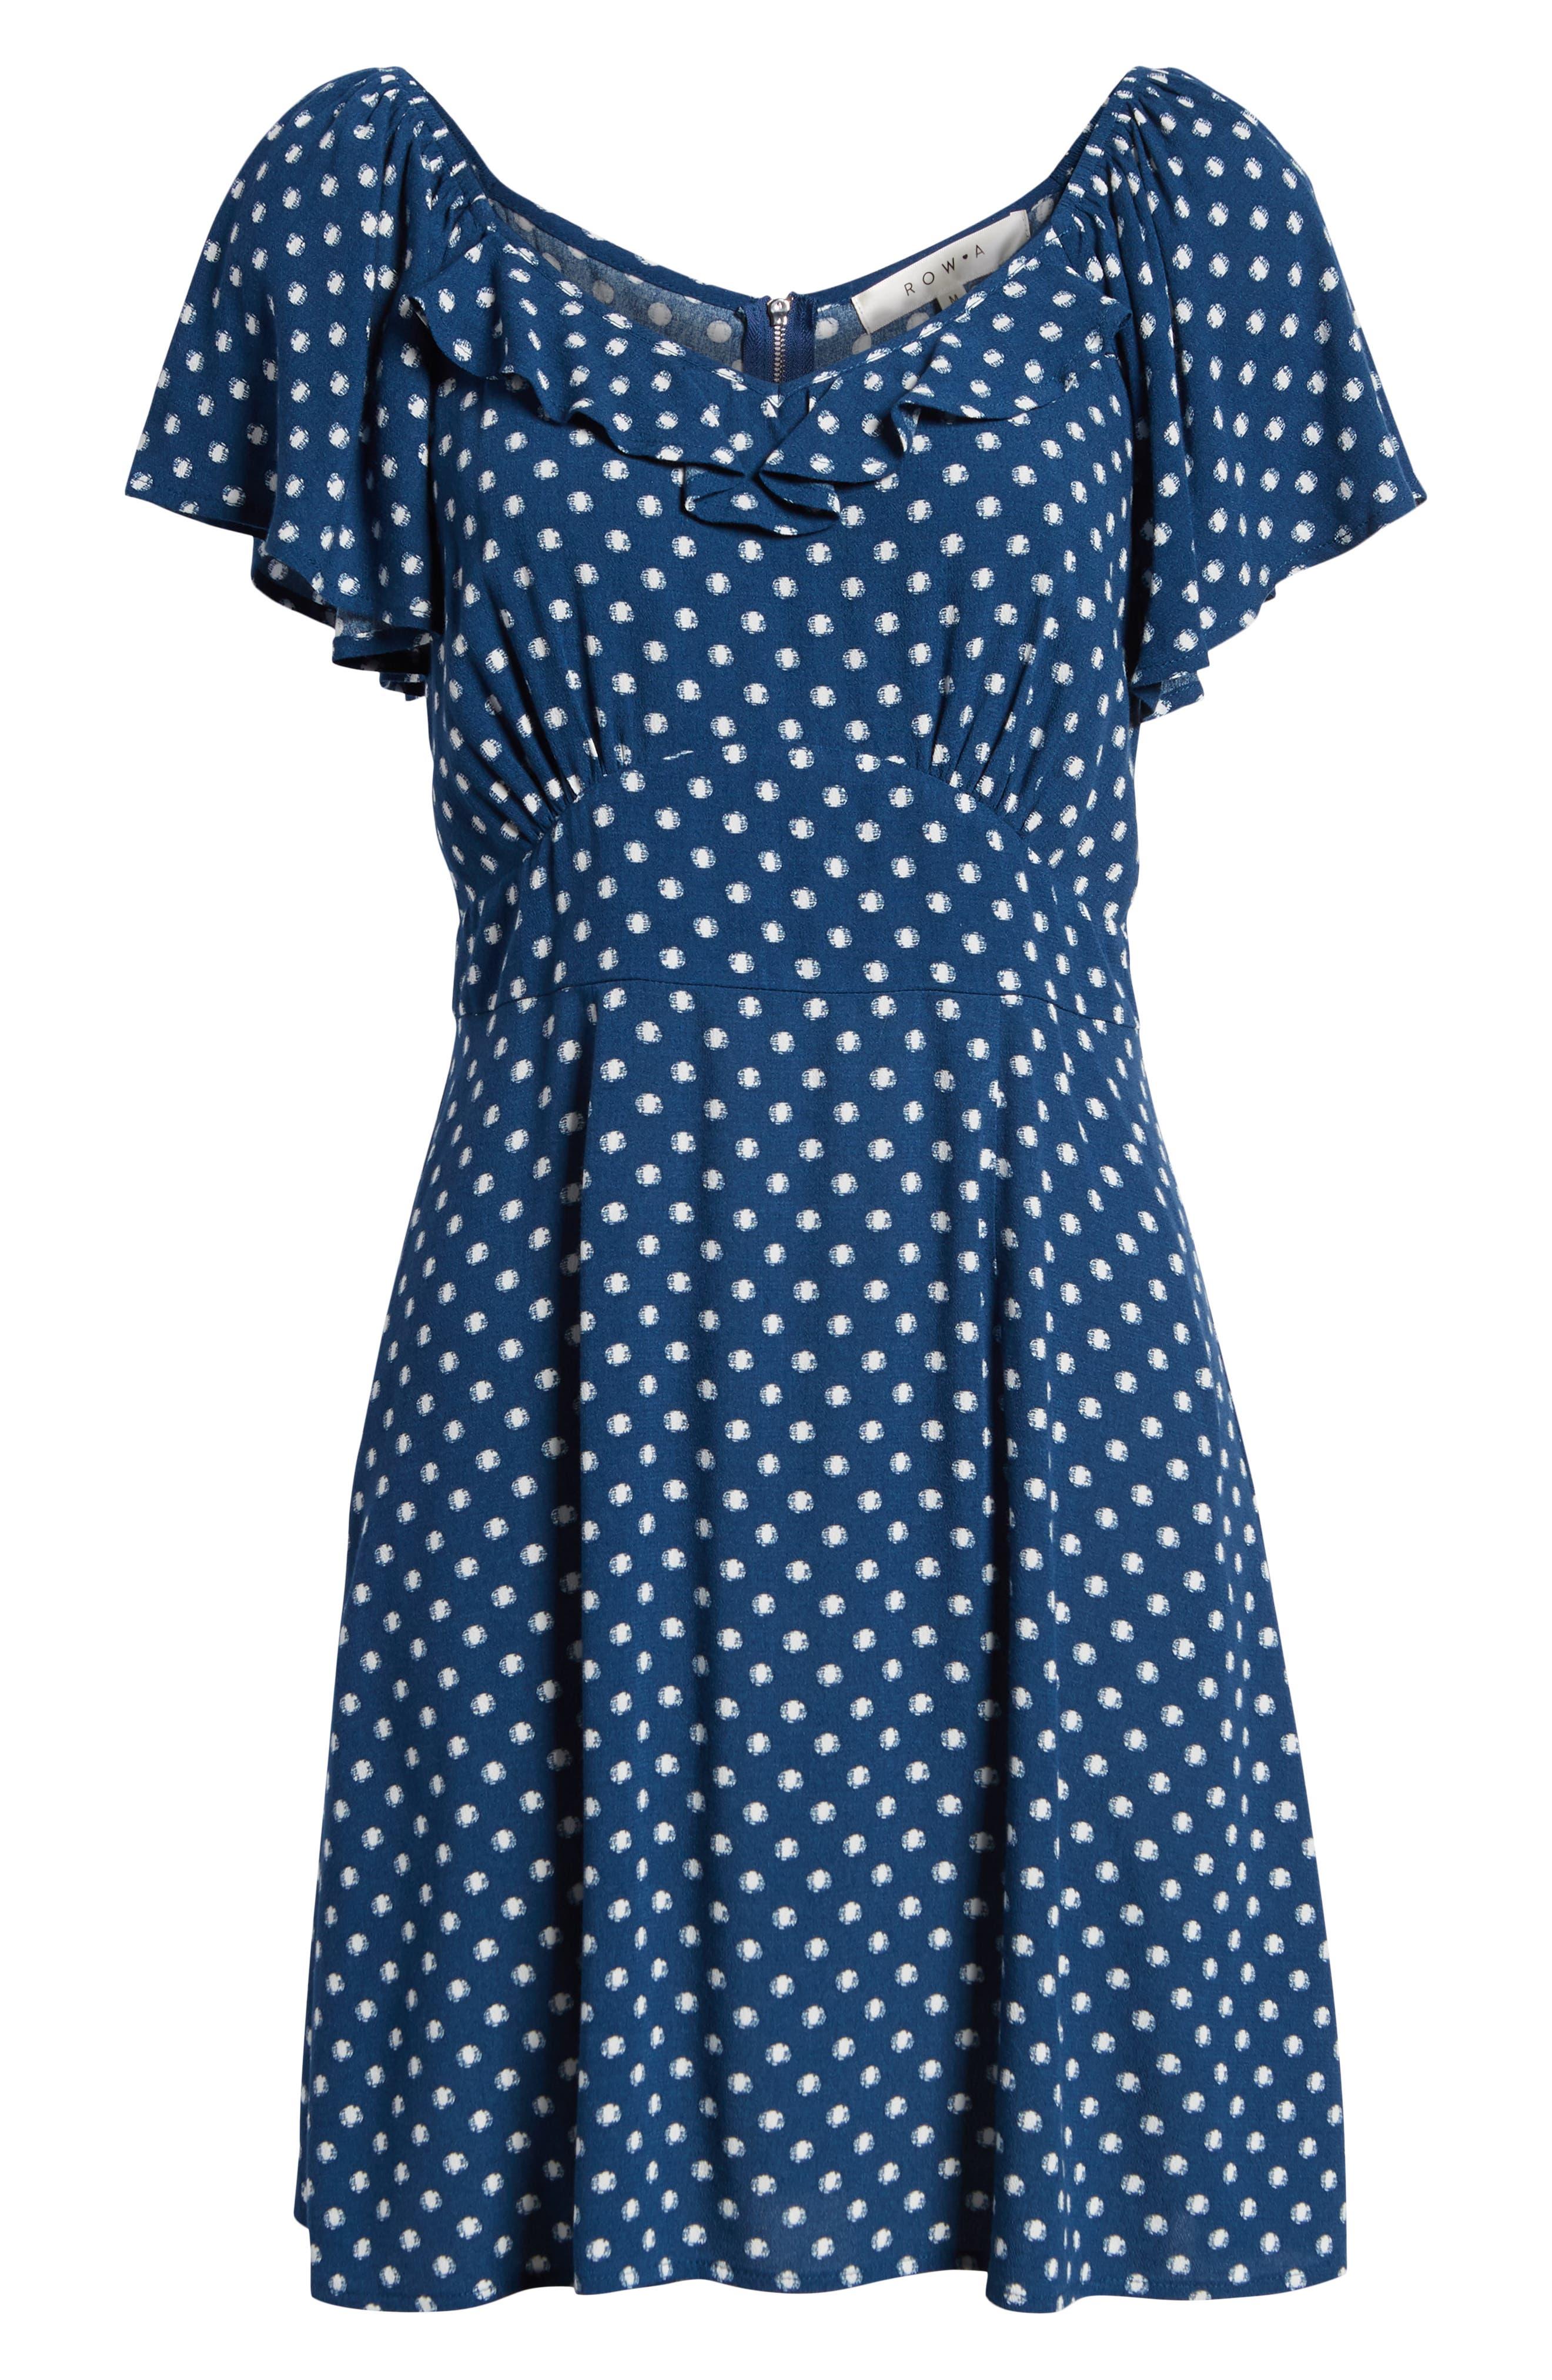 Flutter Sleeve A-Line Dress,                             Alternate thumbnail 7, color,                             BLUE DOT